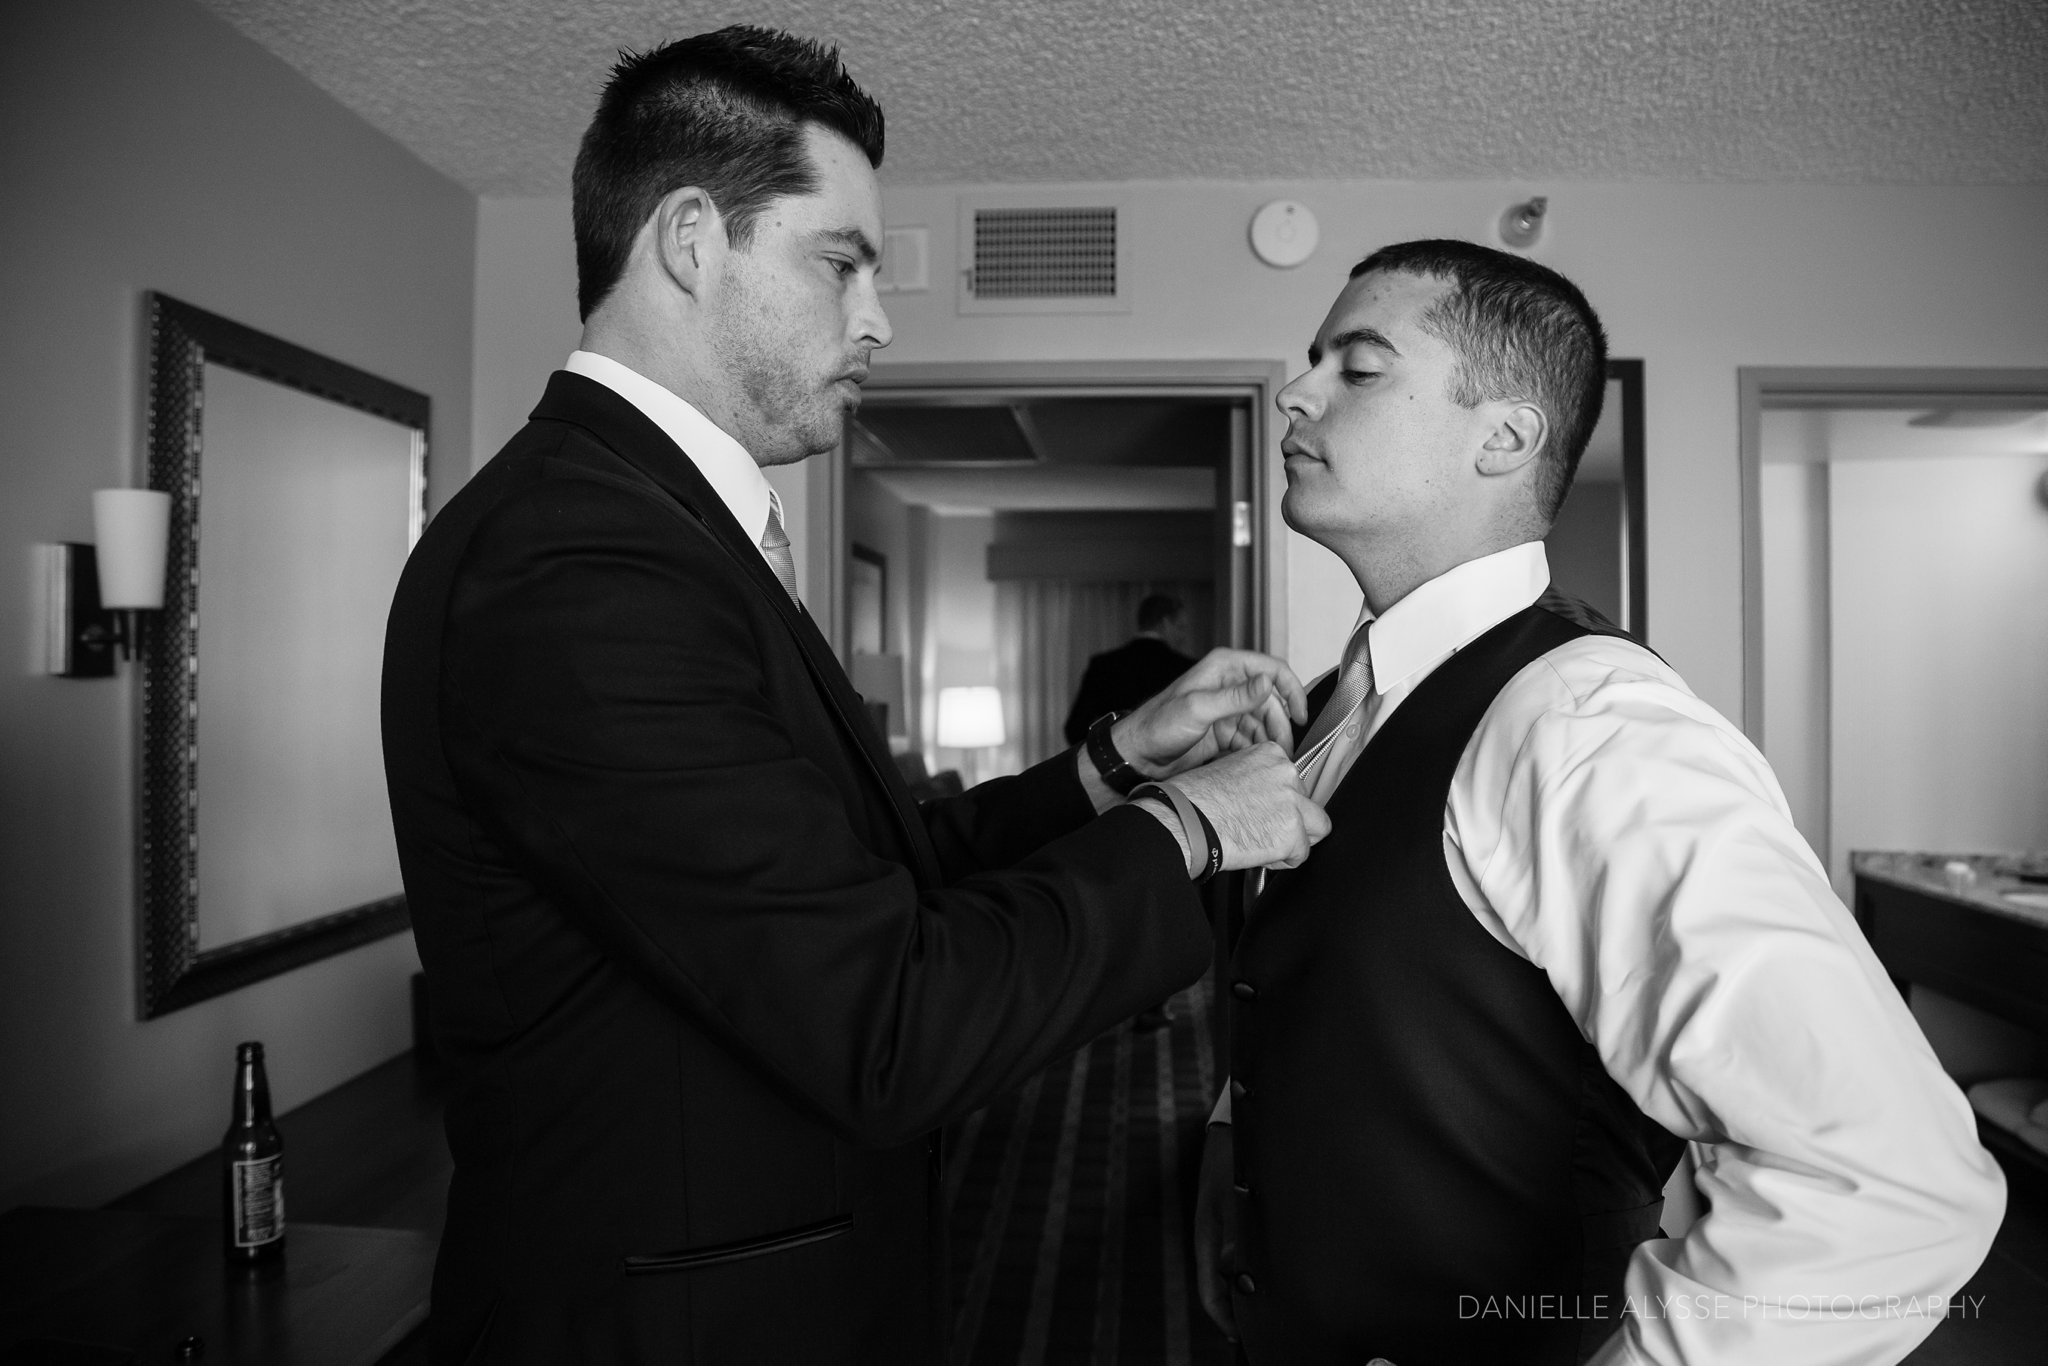 170429_blog_kimberly_ben_wedding_san_mateo_curiodyssey_danielle_alysse_photography_sacramento_photographer0089_WEB.jpg